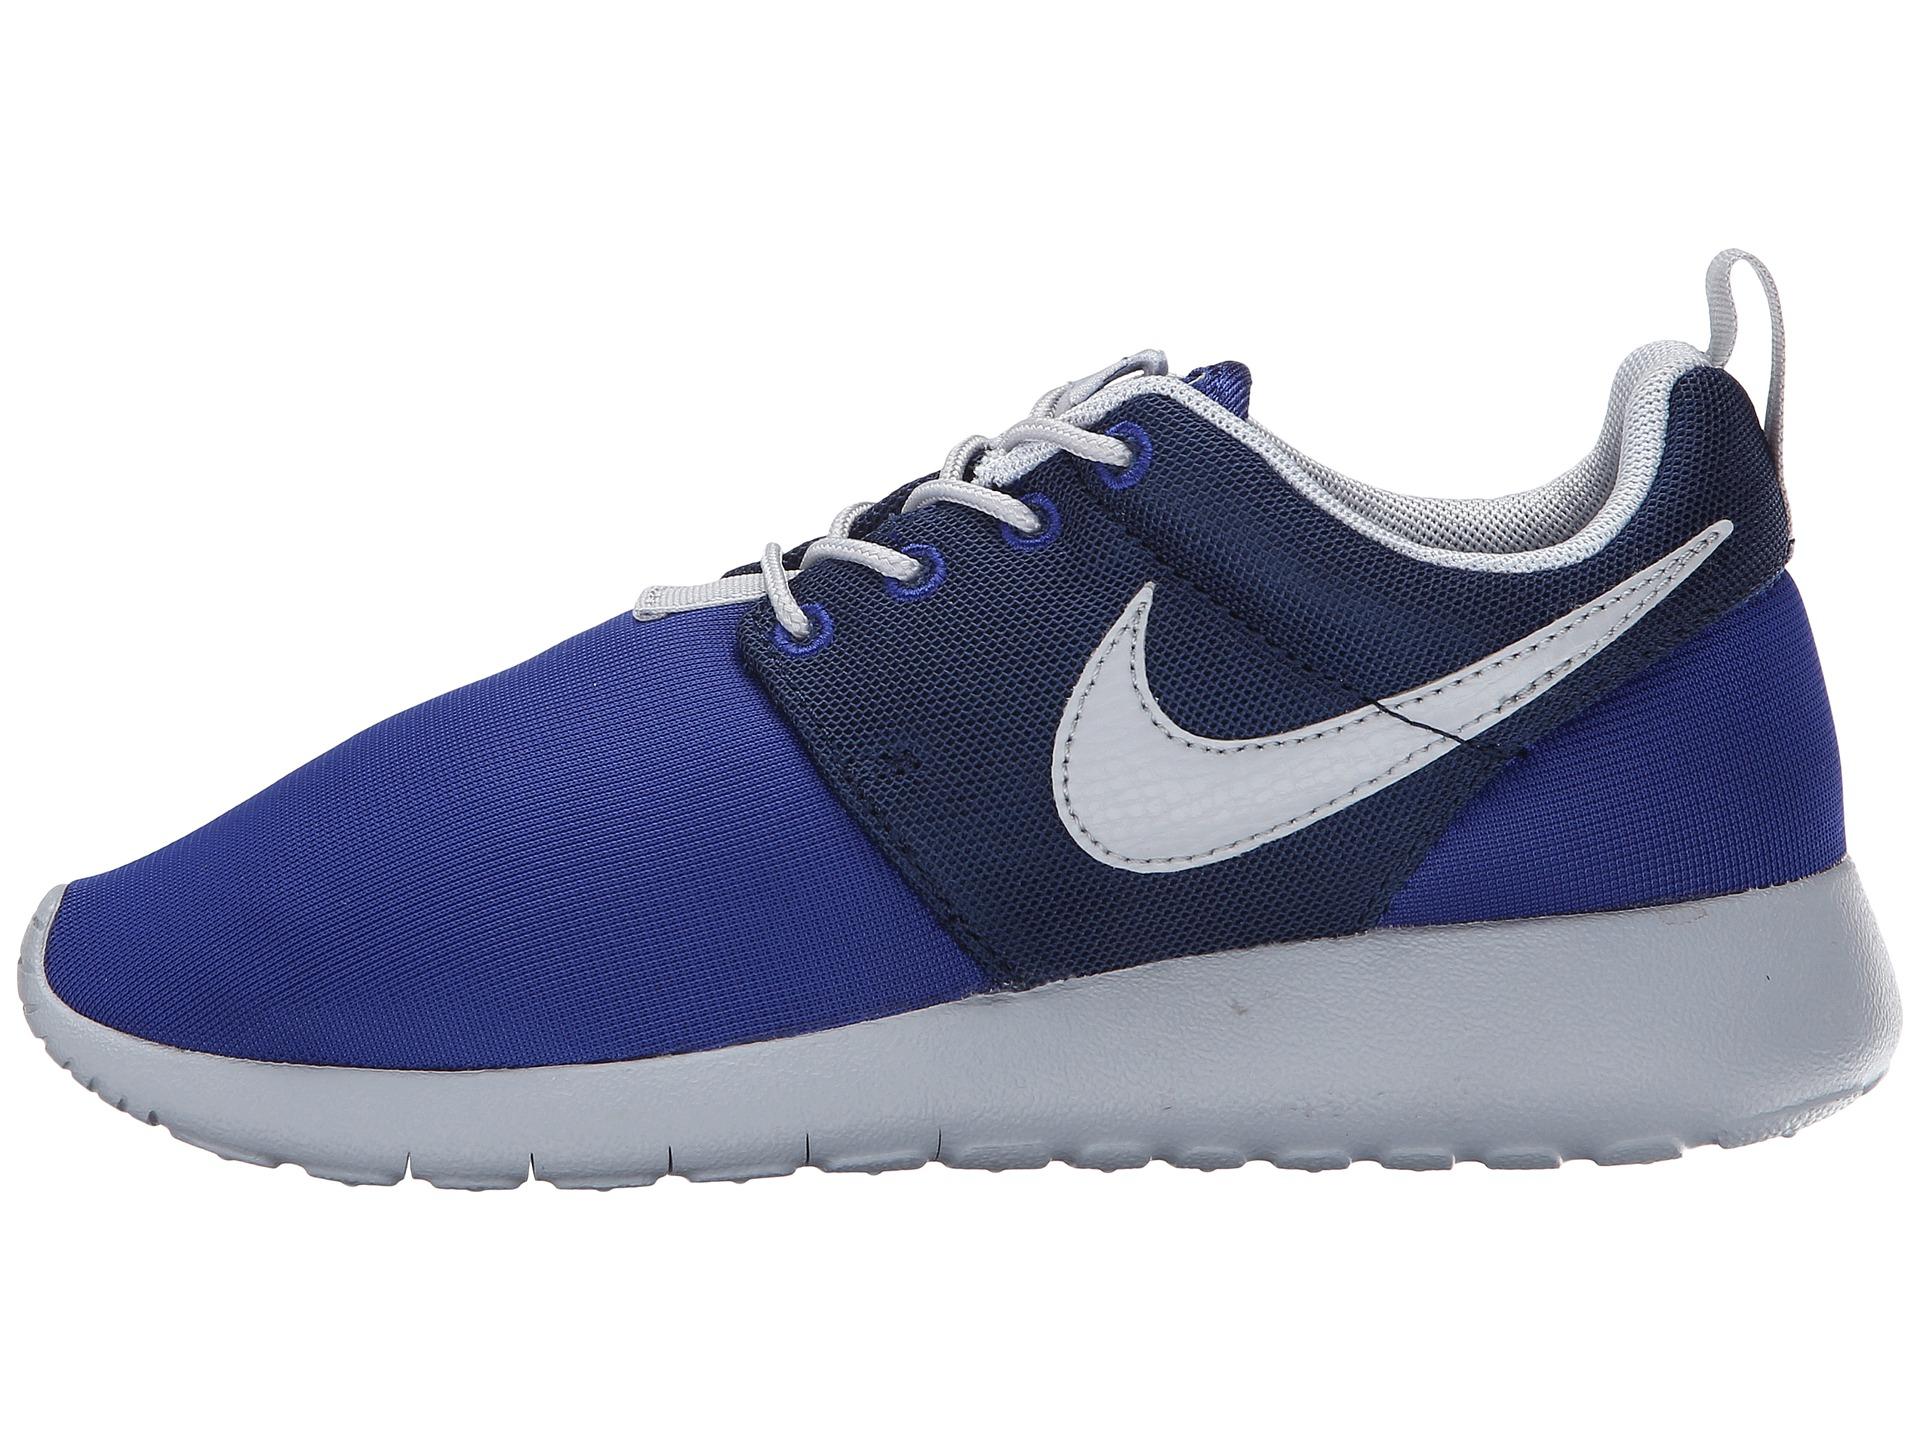 Nike Roshe Run Mens Zappos